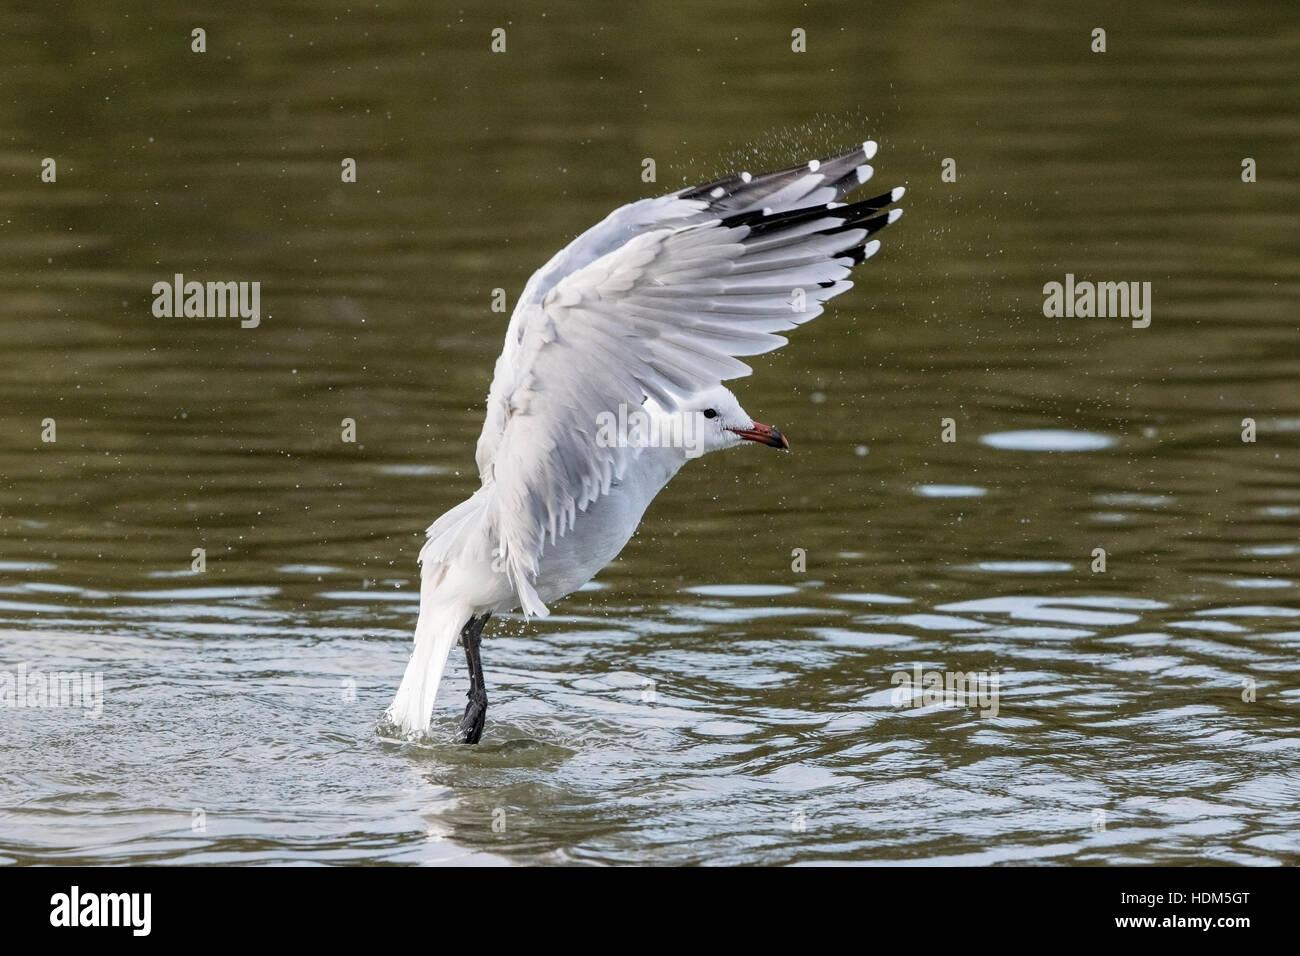 Audouin's gull (Ichthyaetus audouinii) single adult bathing in water, Mallorca, Balearic Islands - Stock Image